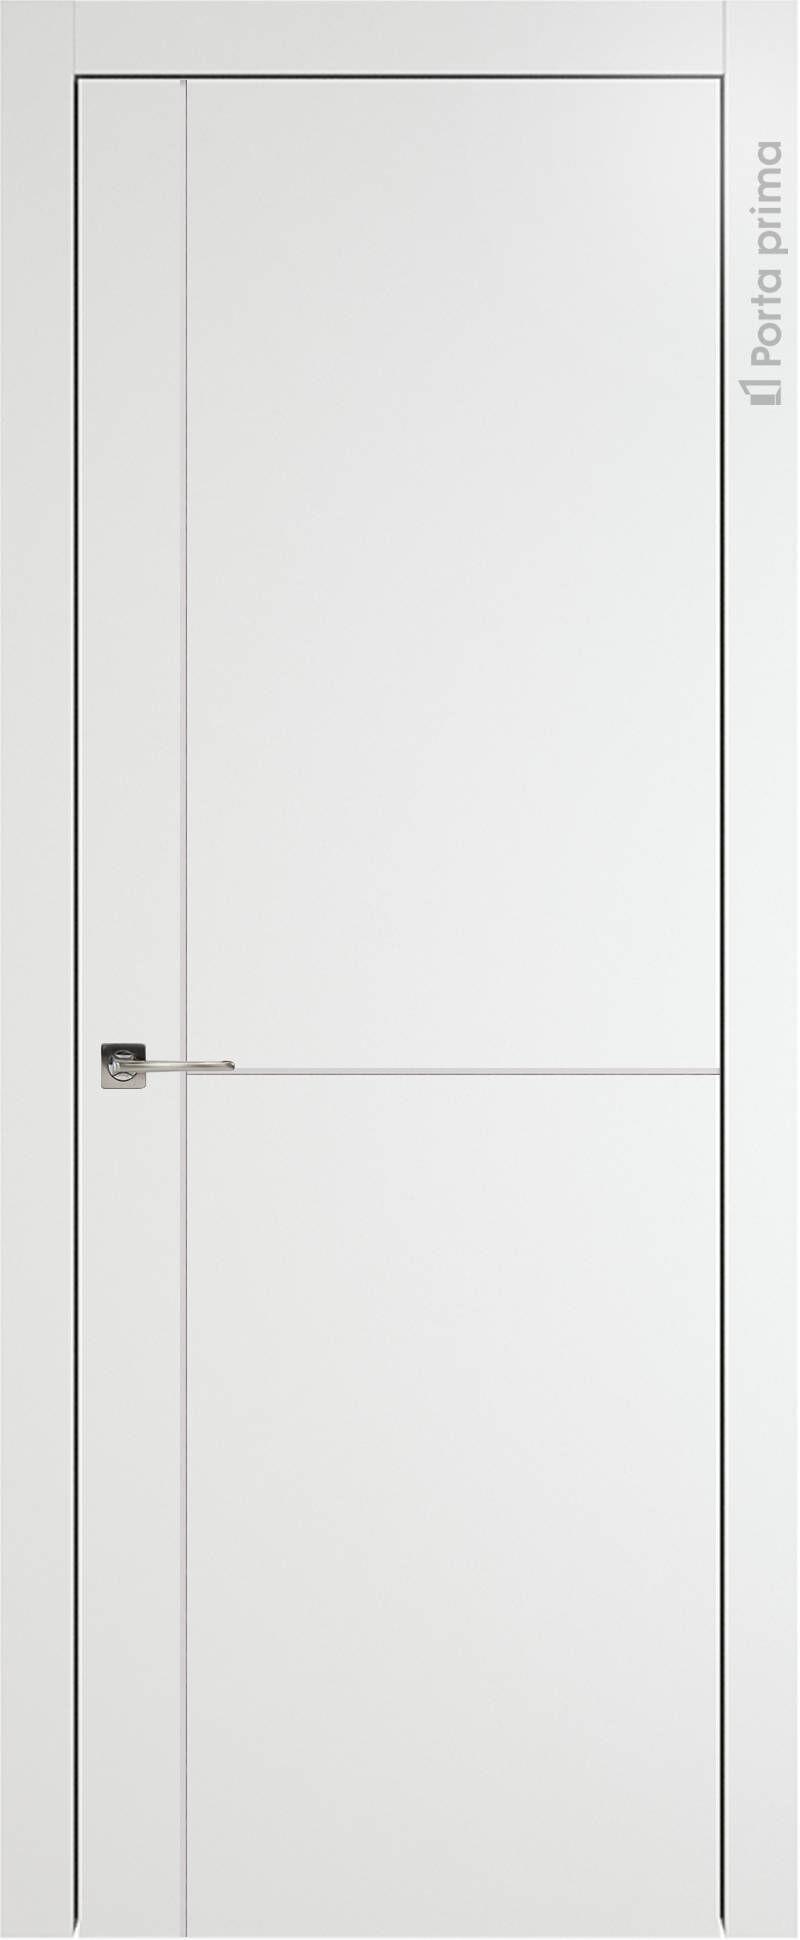 Tivoli Е-3 цвет - Белая эмаль (RAL 9003) Без стекла (ДГ)